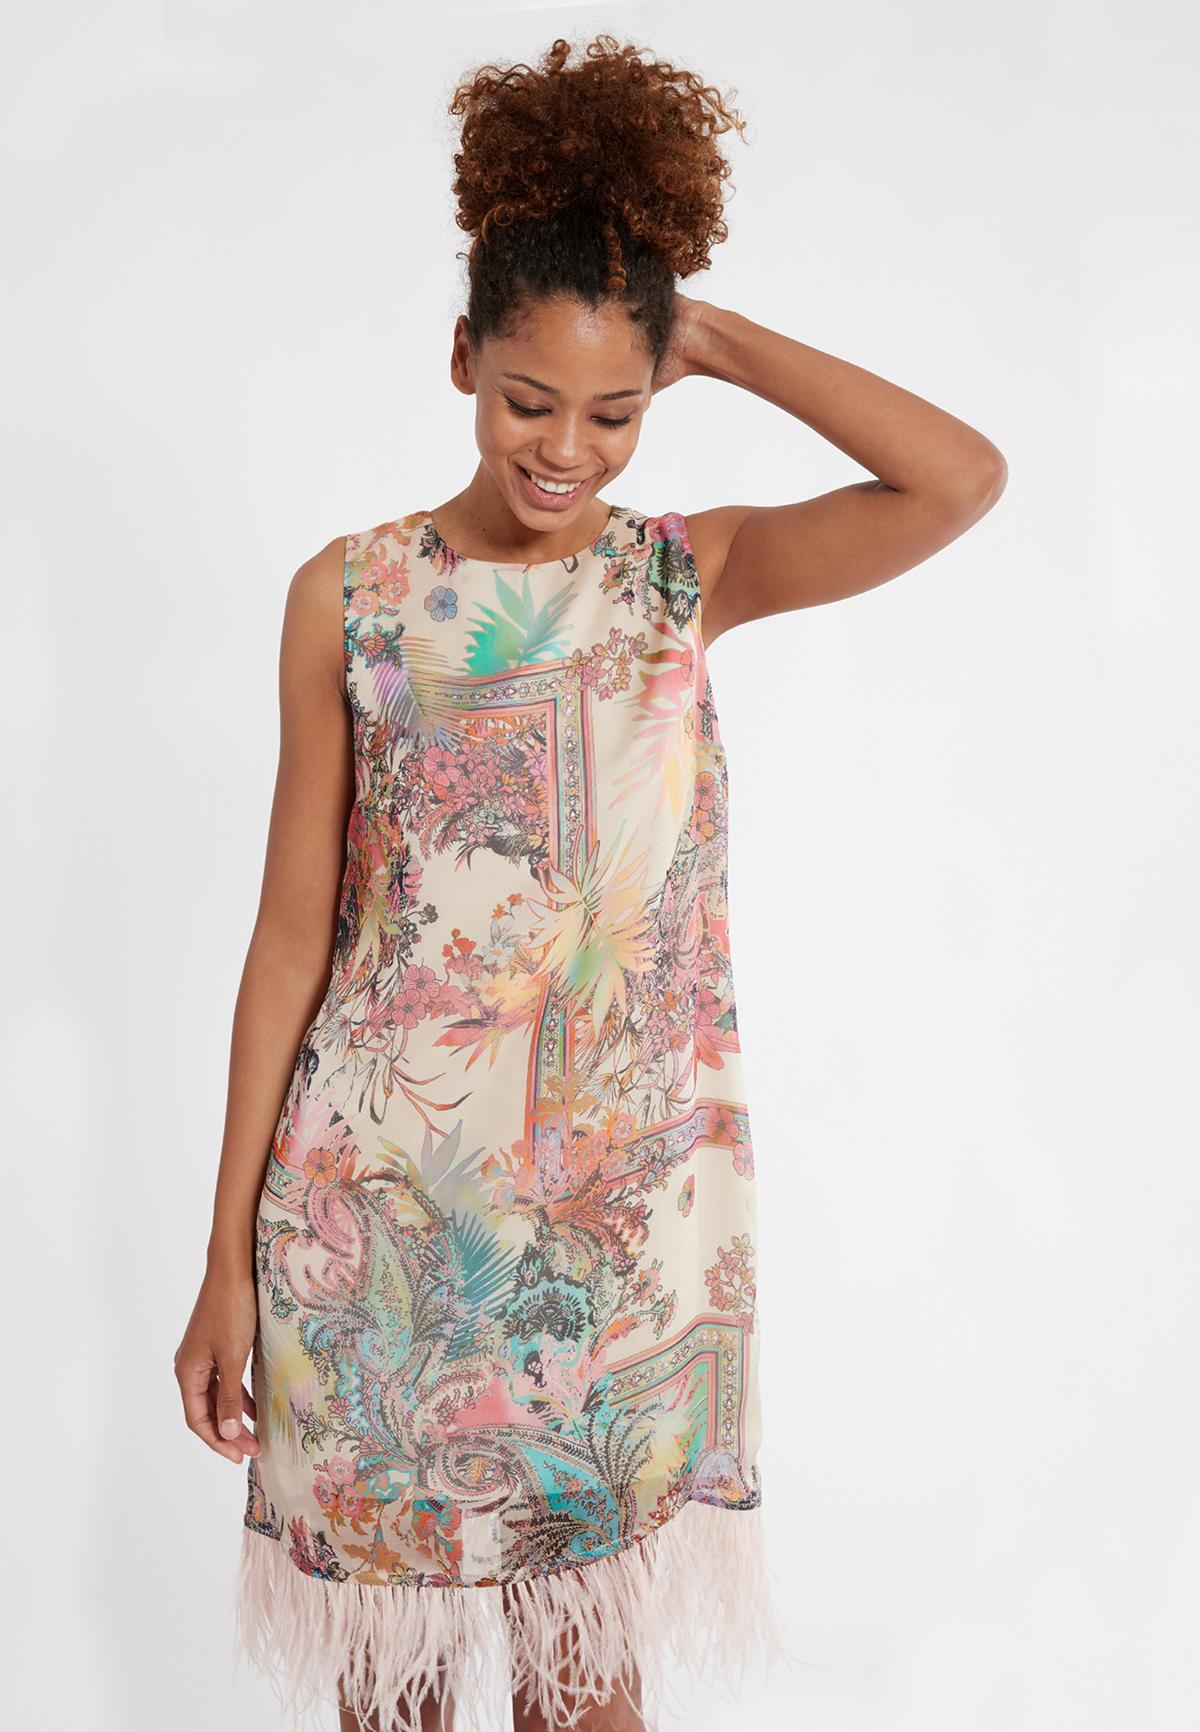 Front of Ana Alcazar A-Shaped Dress Sekato Beige  worn by model